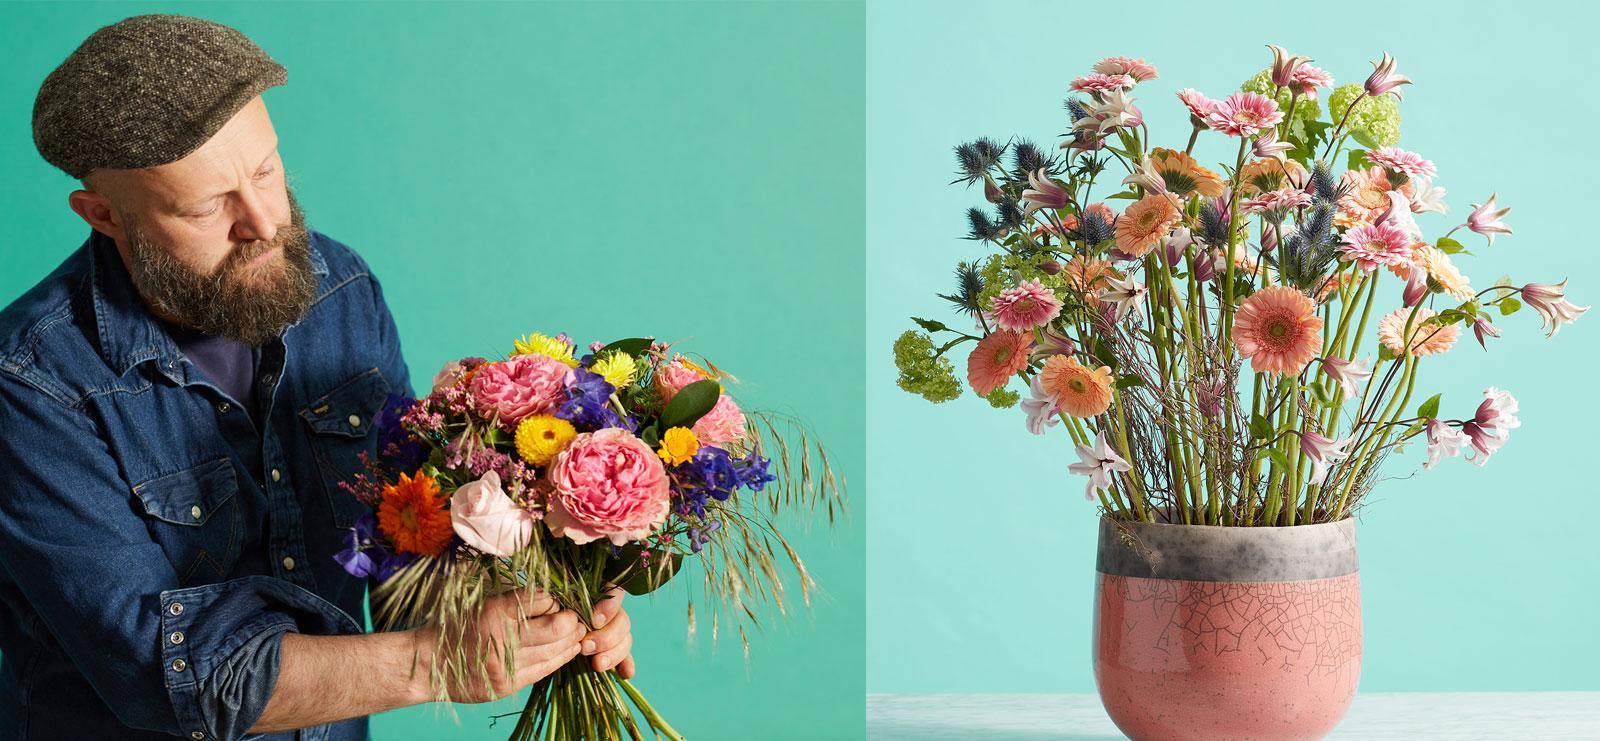 Bo Bülls online blomsterbinder kurser